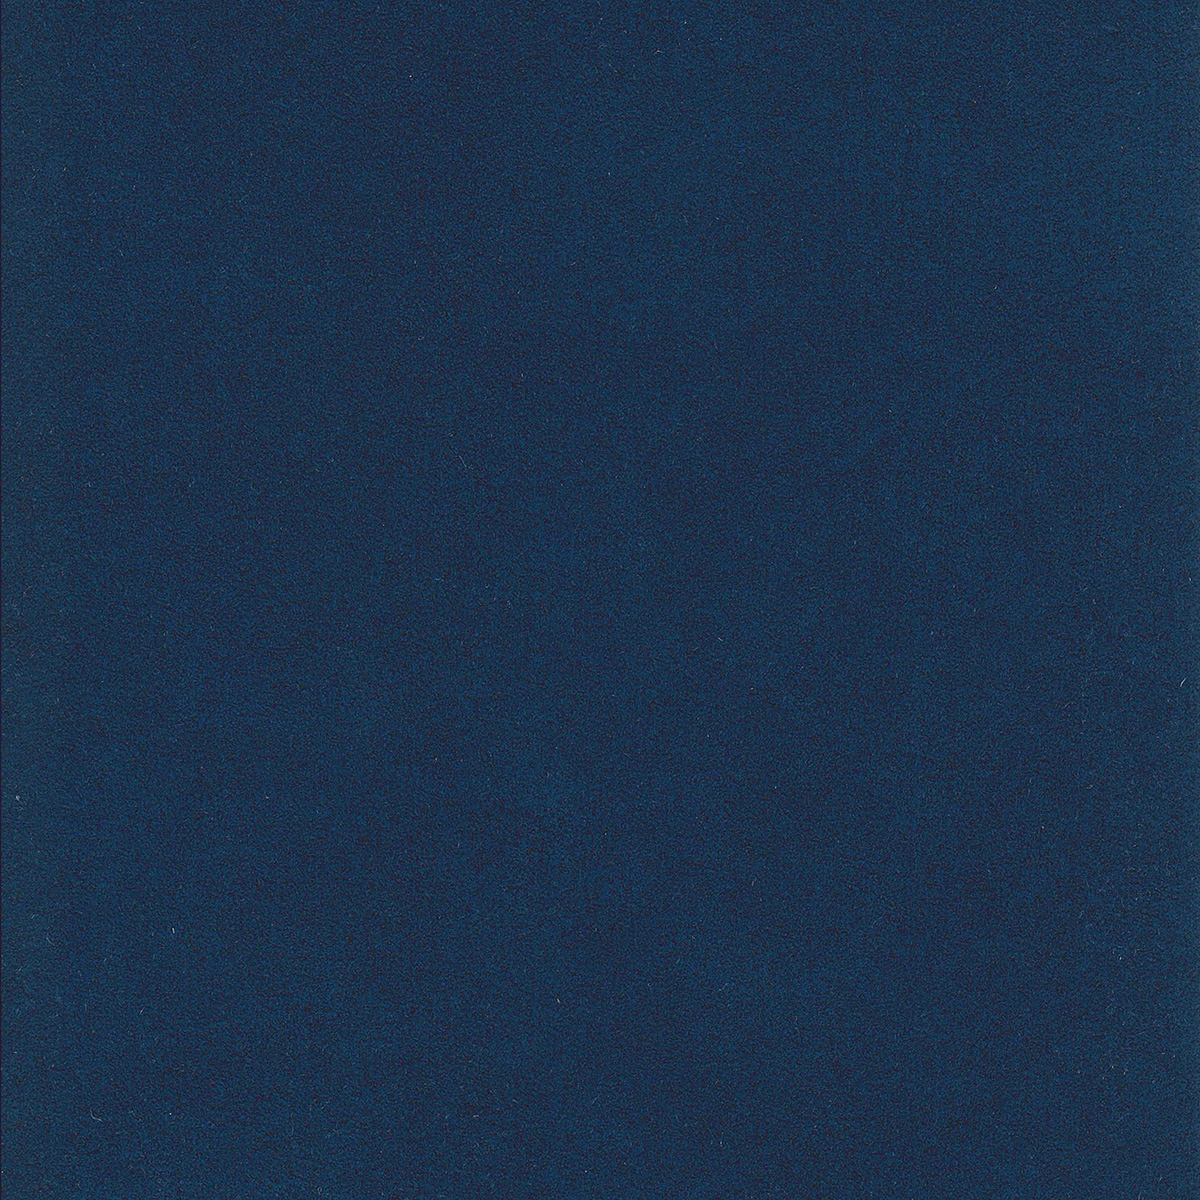 653 Blu Oltremare